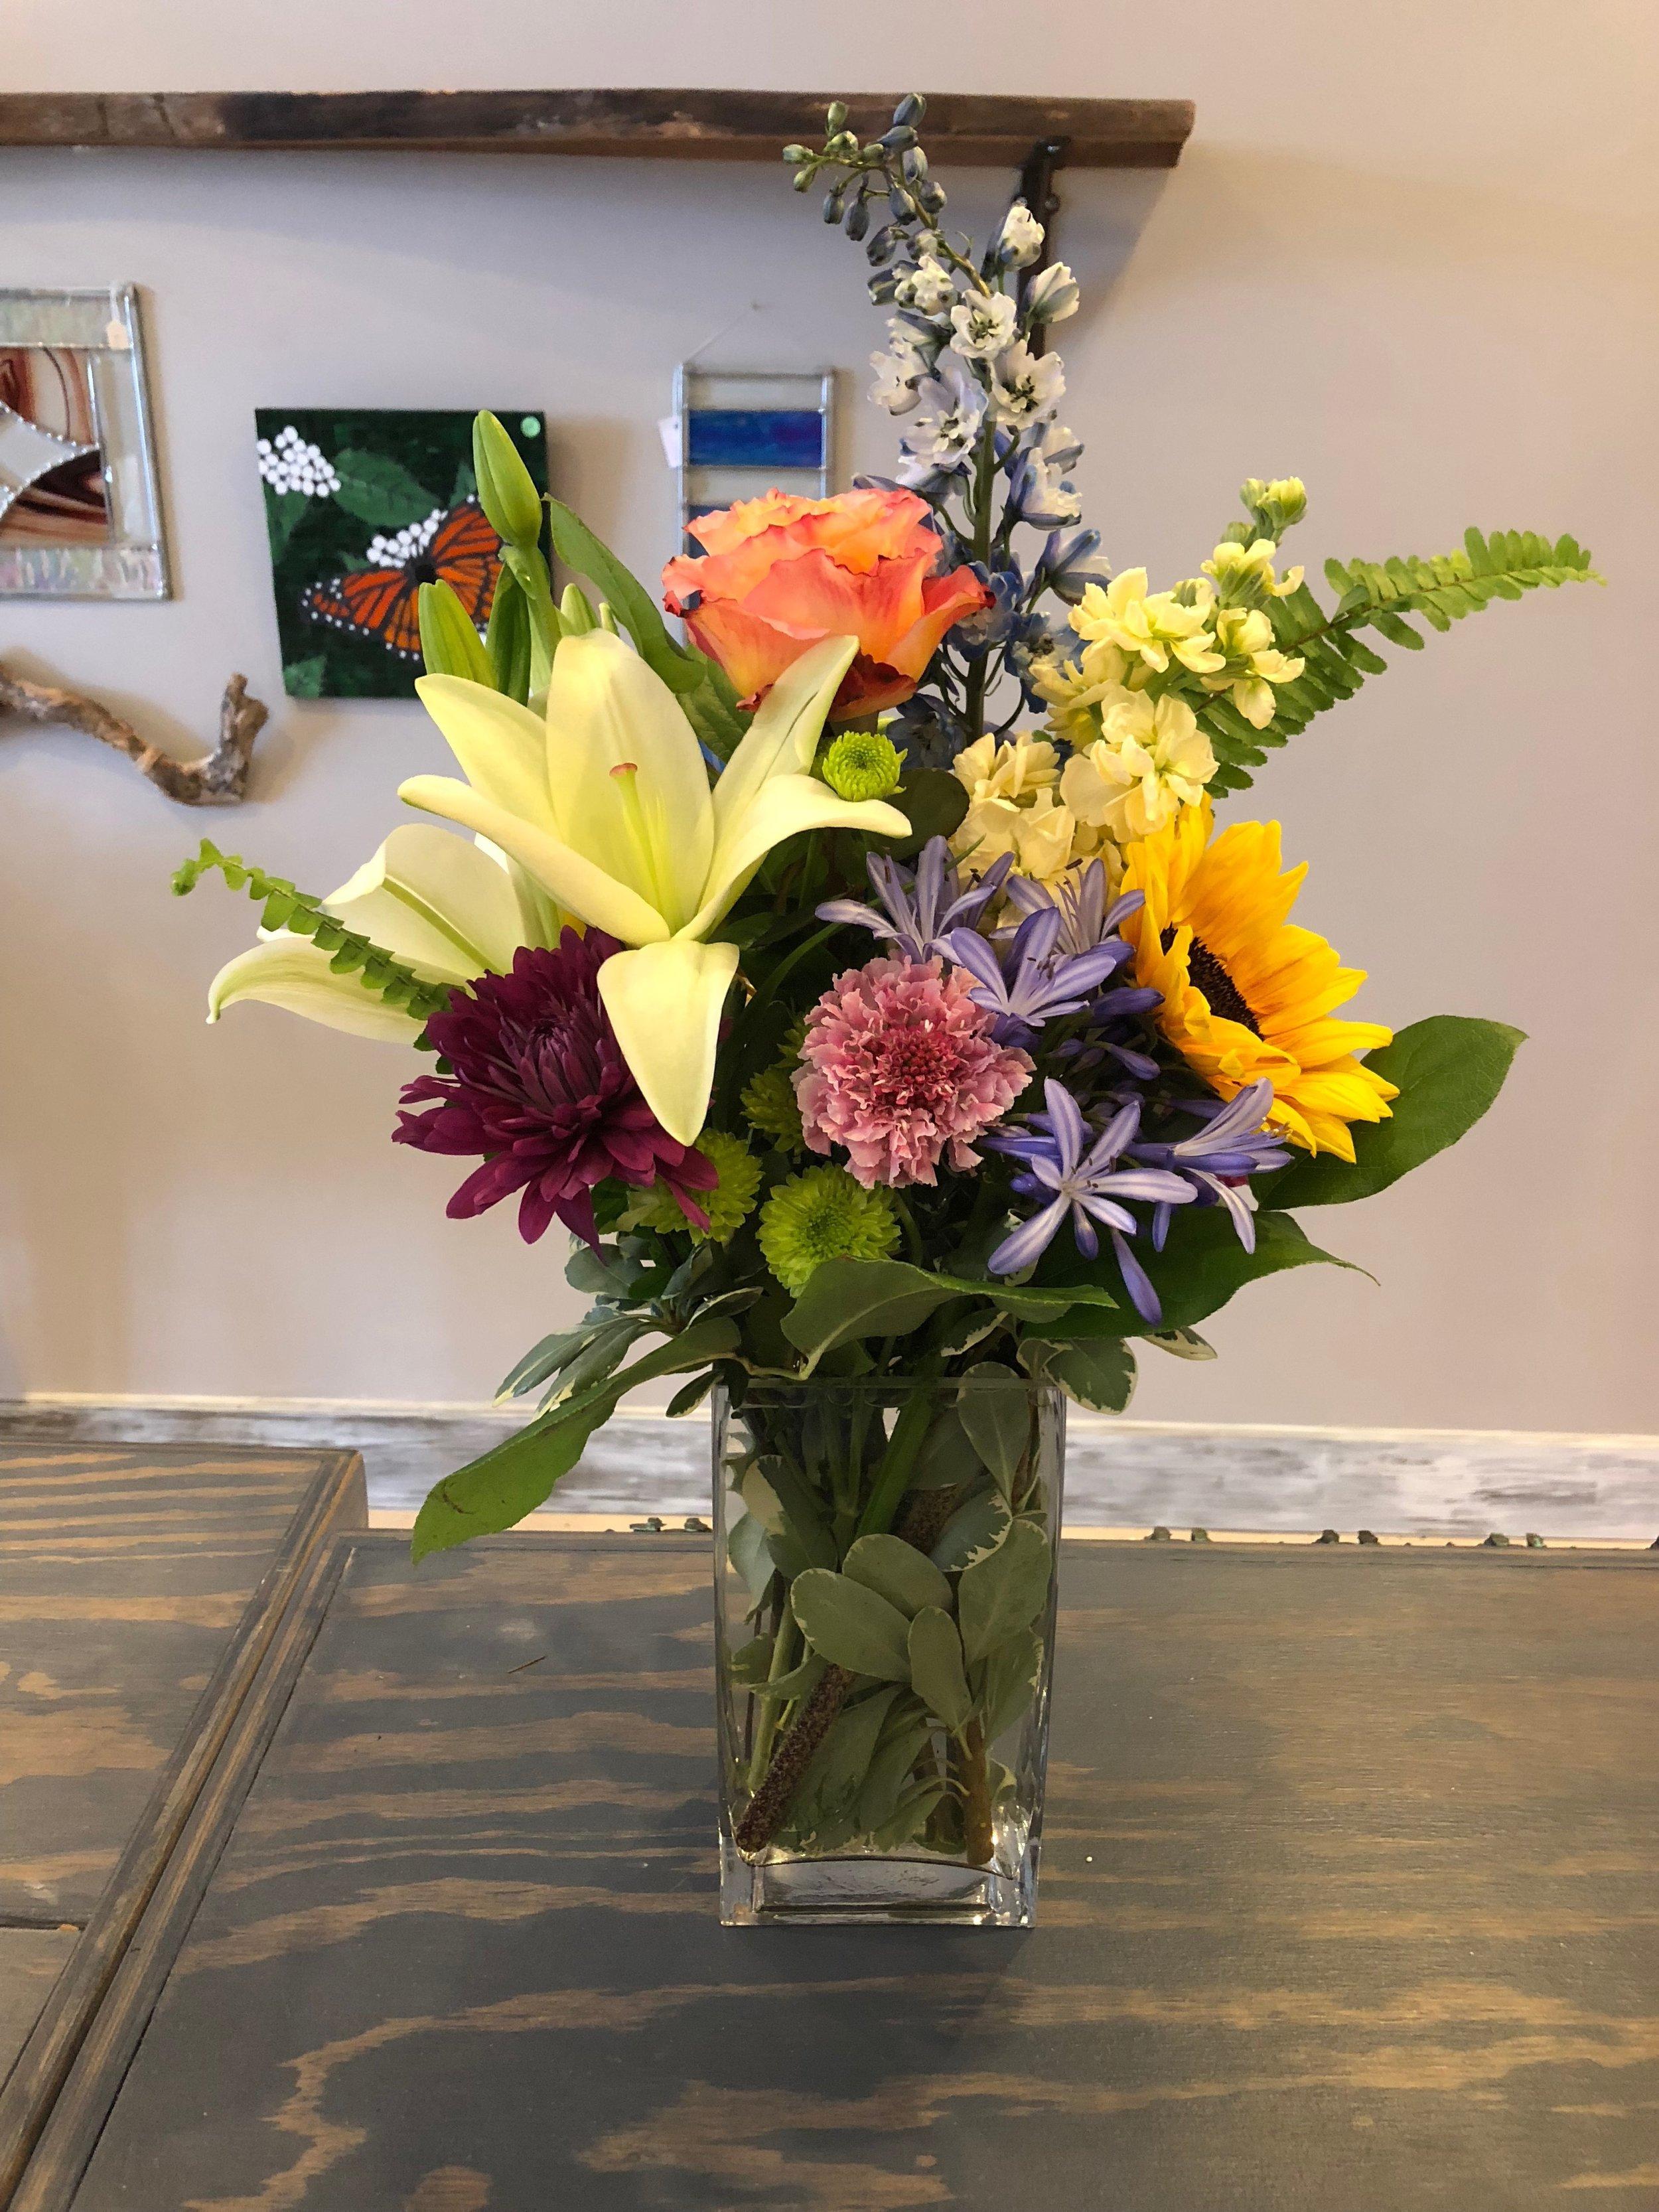 Deluxe - Seasonal mix of florals in an 8 inch vase.$50-75*Pictured arrangement $50